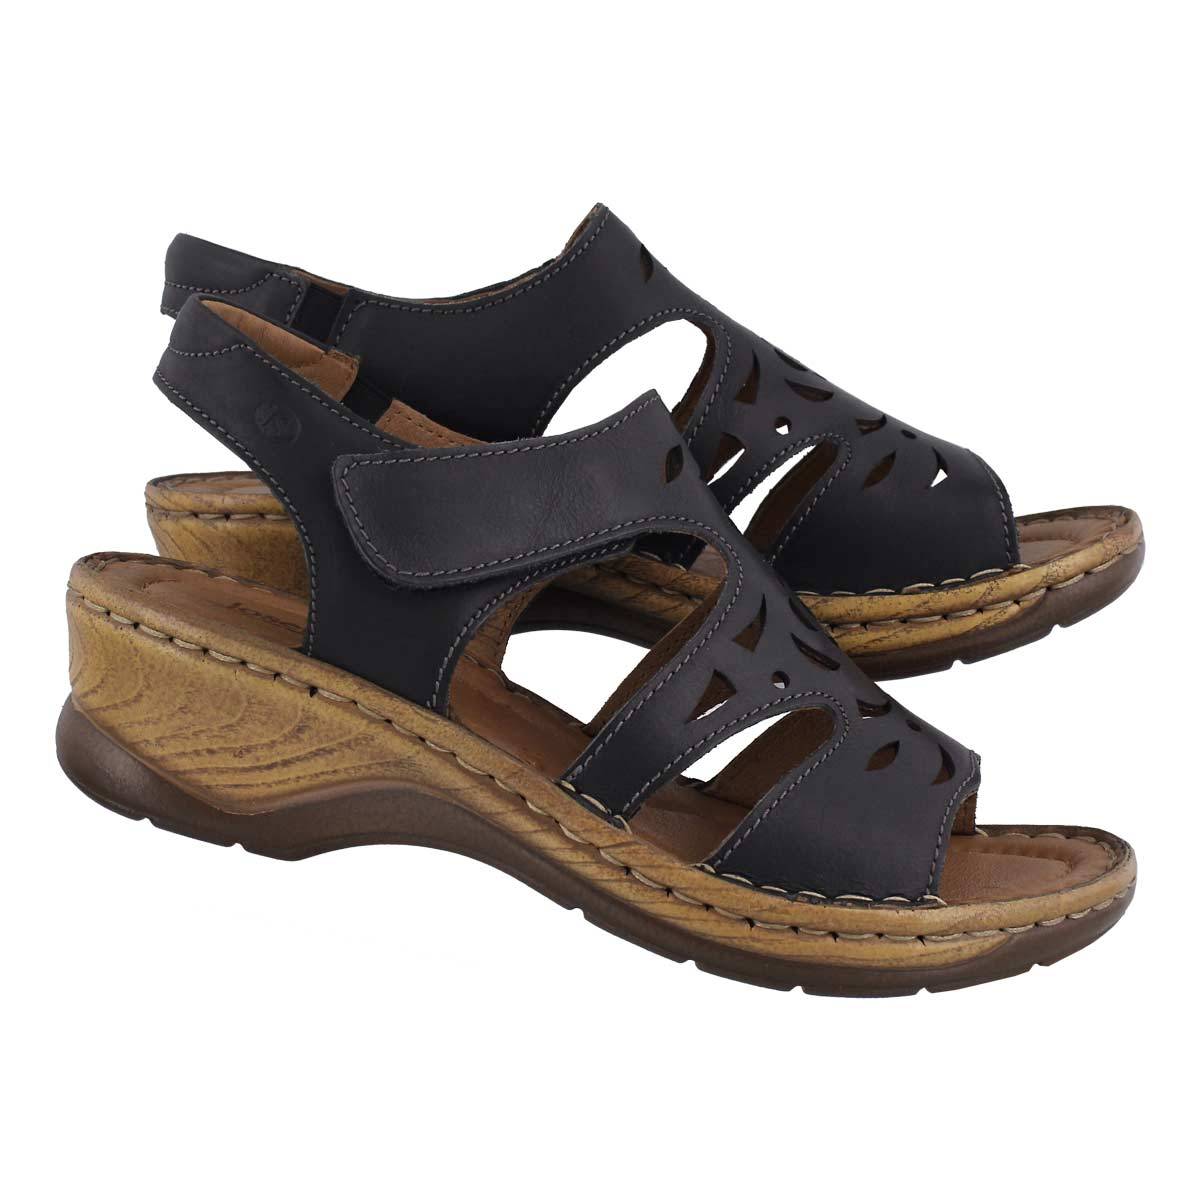 Lds Catalonia 56 black sandal